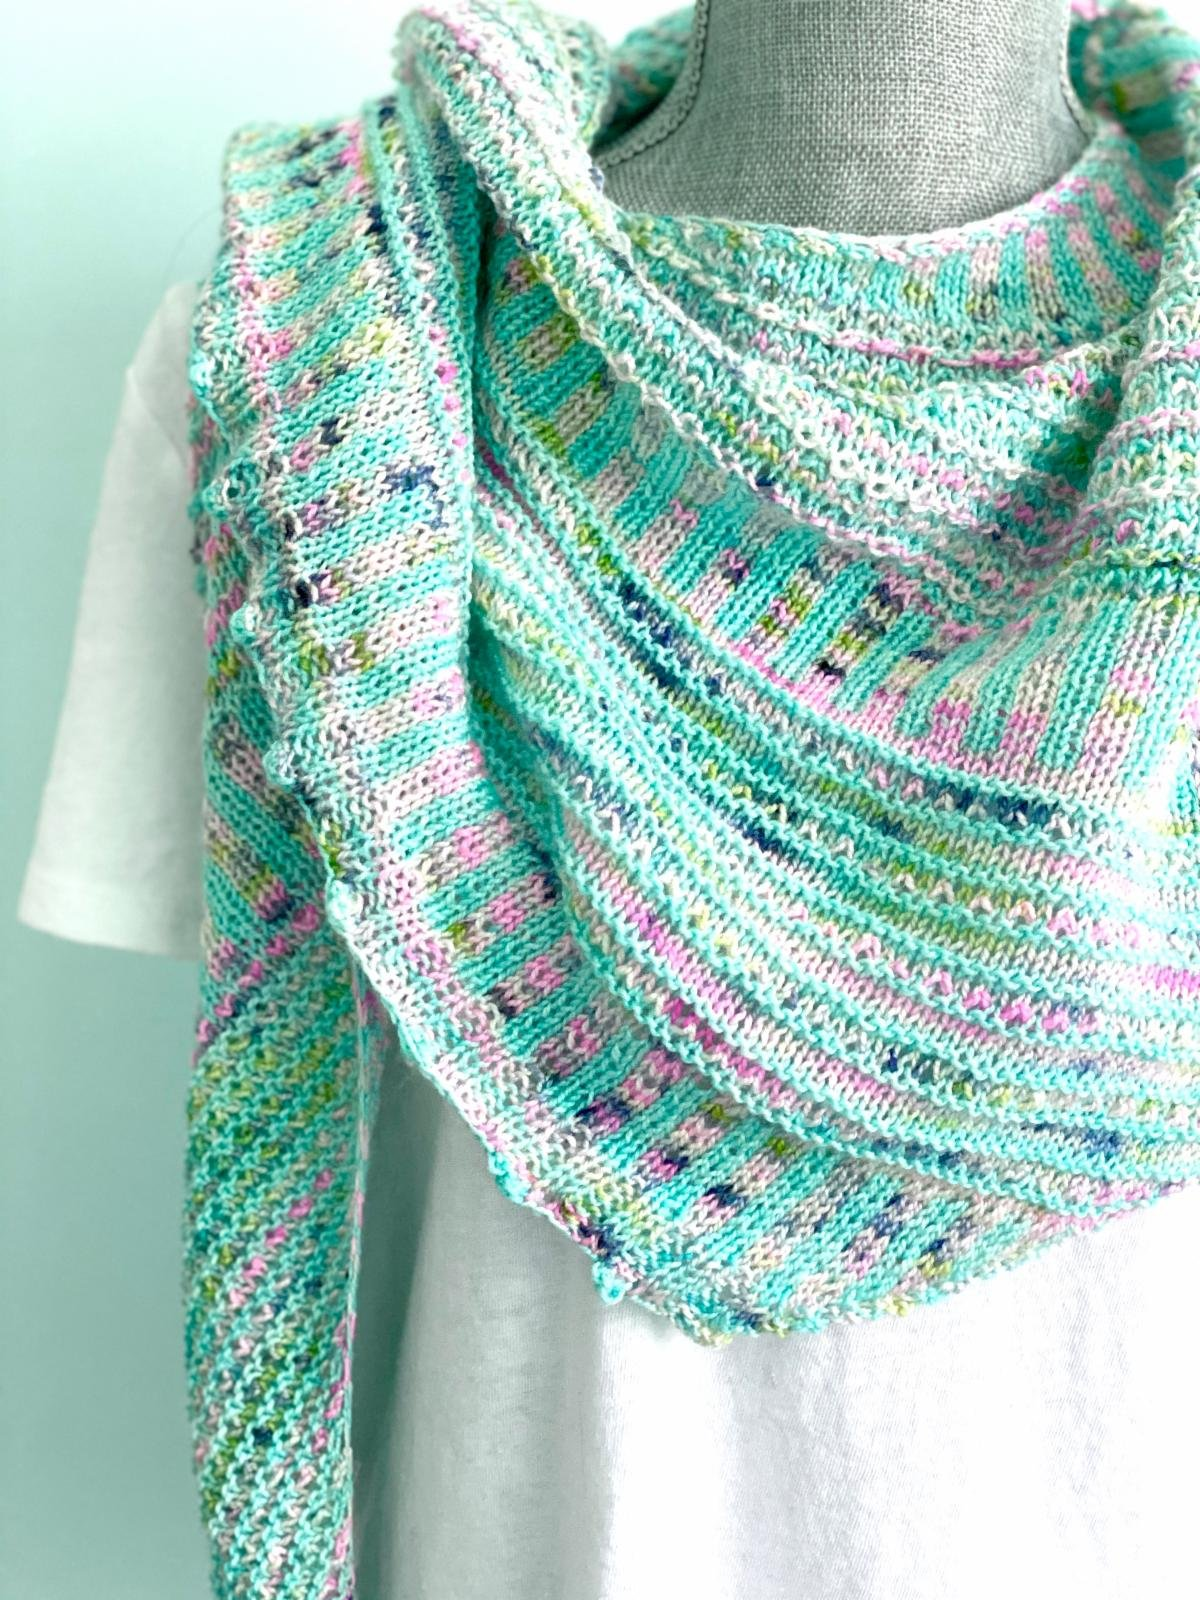 2020 LYS DAY Casapinka Breathe and Hope shawl Kit